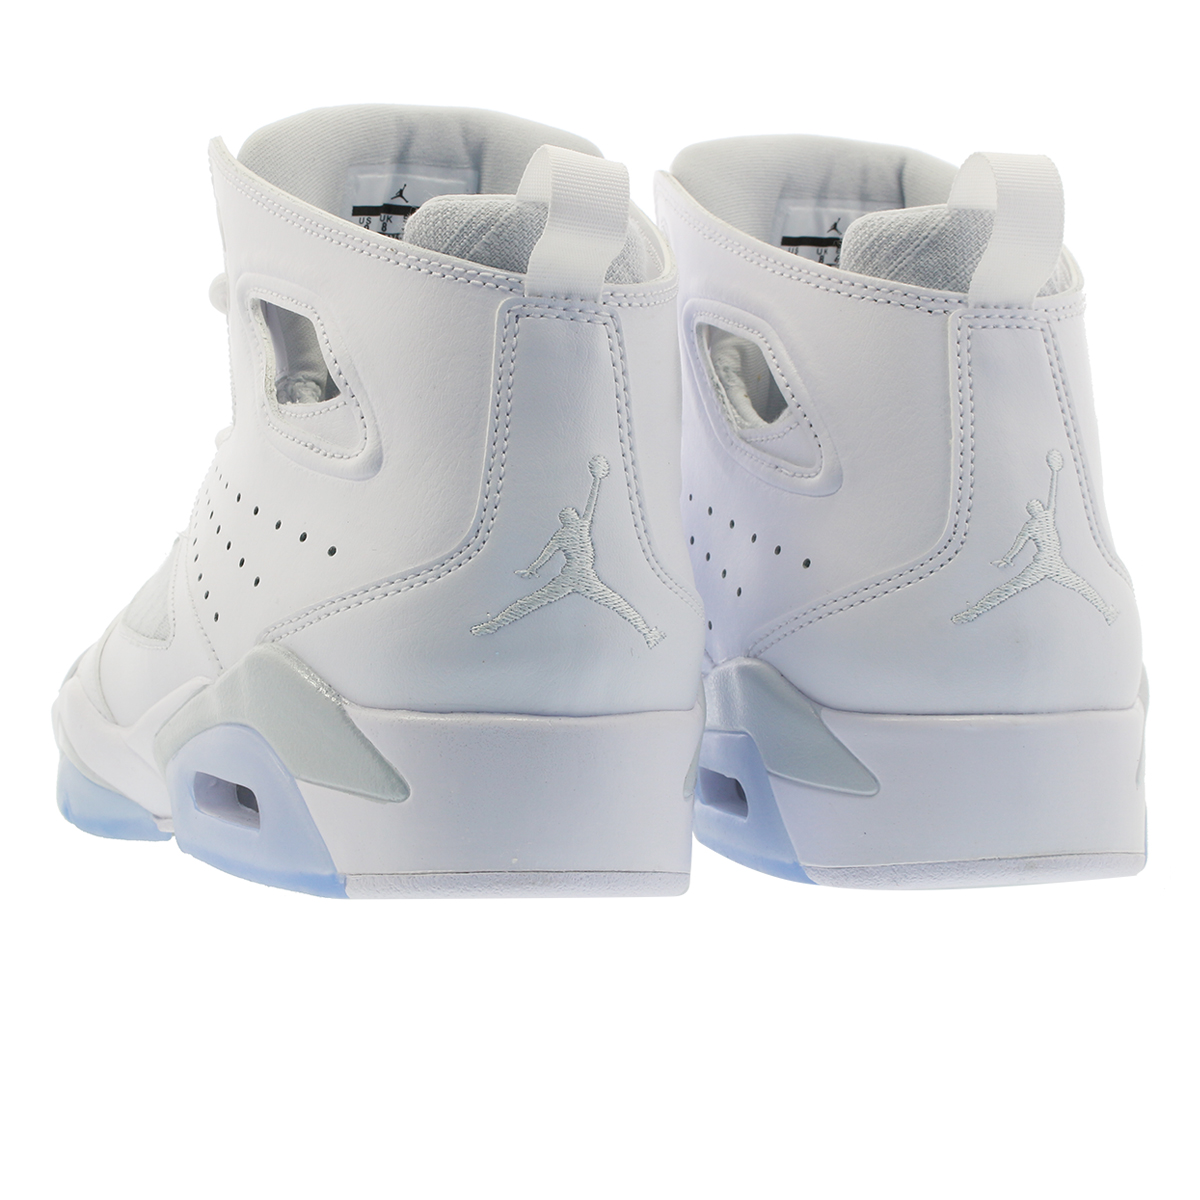 c7392271a77ad8 NIKE JORDAN FLIGHT CLUB 91 Nike Jordan flight club 91 WHITE PURE PLATINUM  555